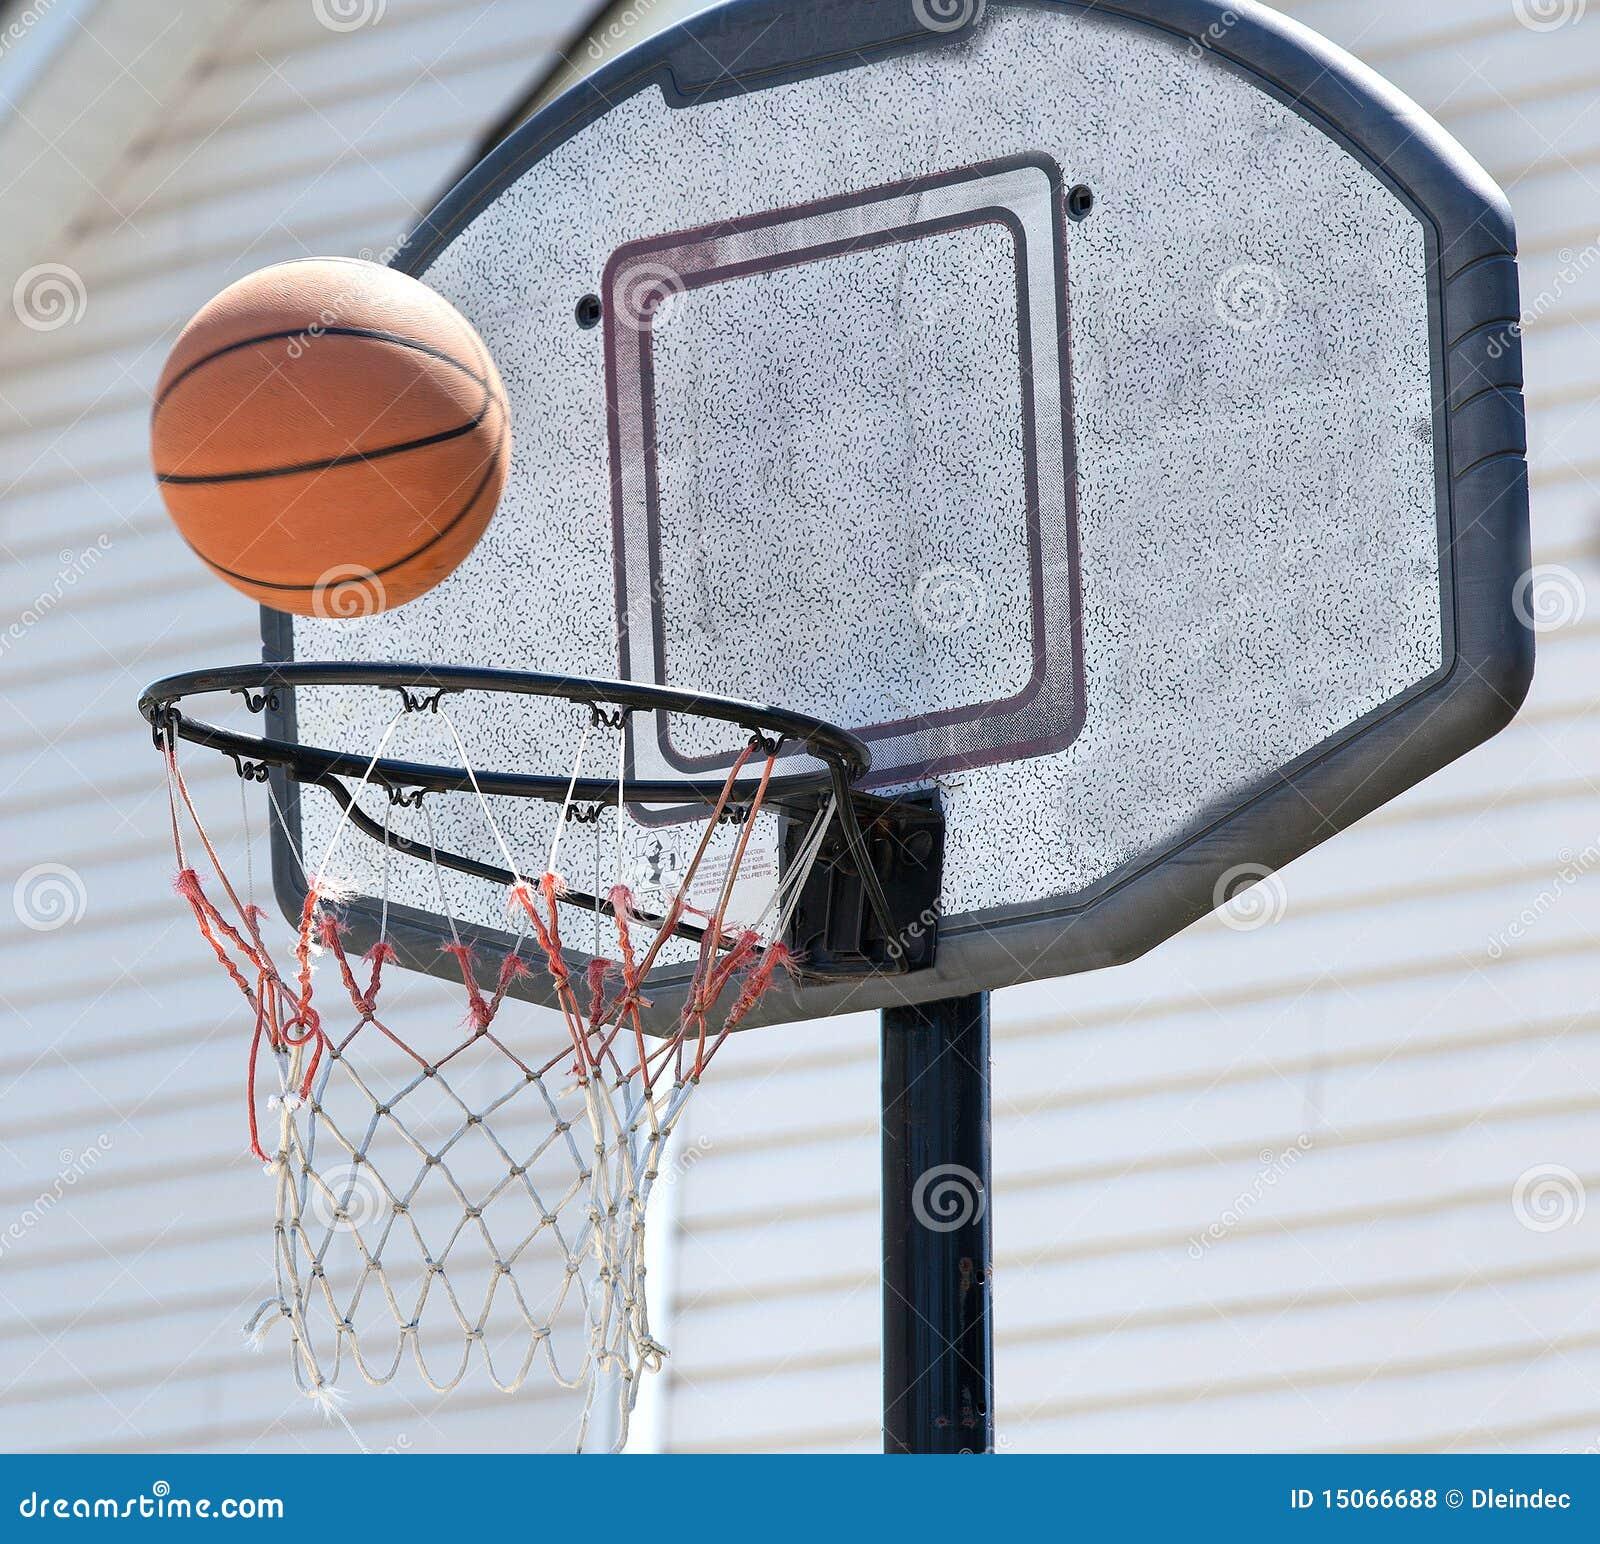 well used backyard backetball hoop and ball royalty free stock